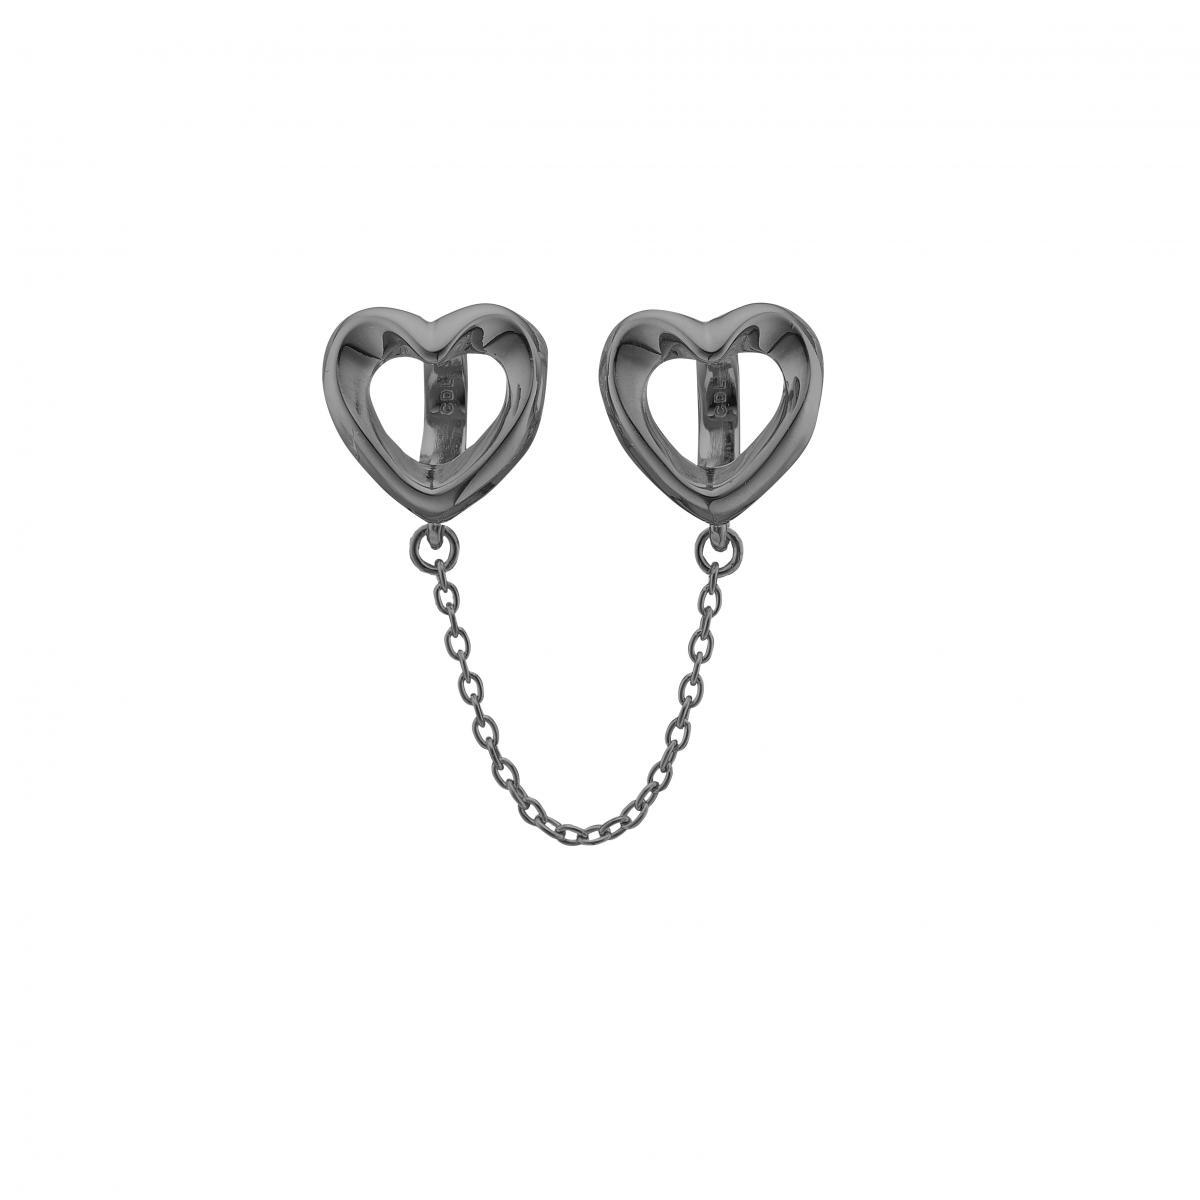 Christina safety hearts charm black  - 630-b99 fra christina watches på brodersen + kobborg